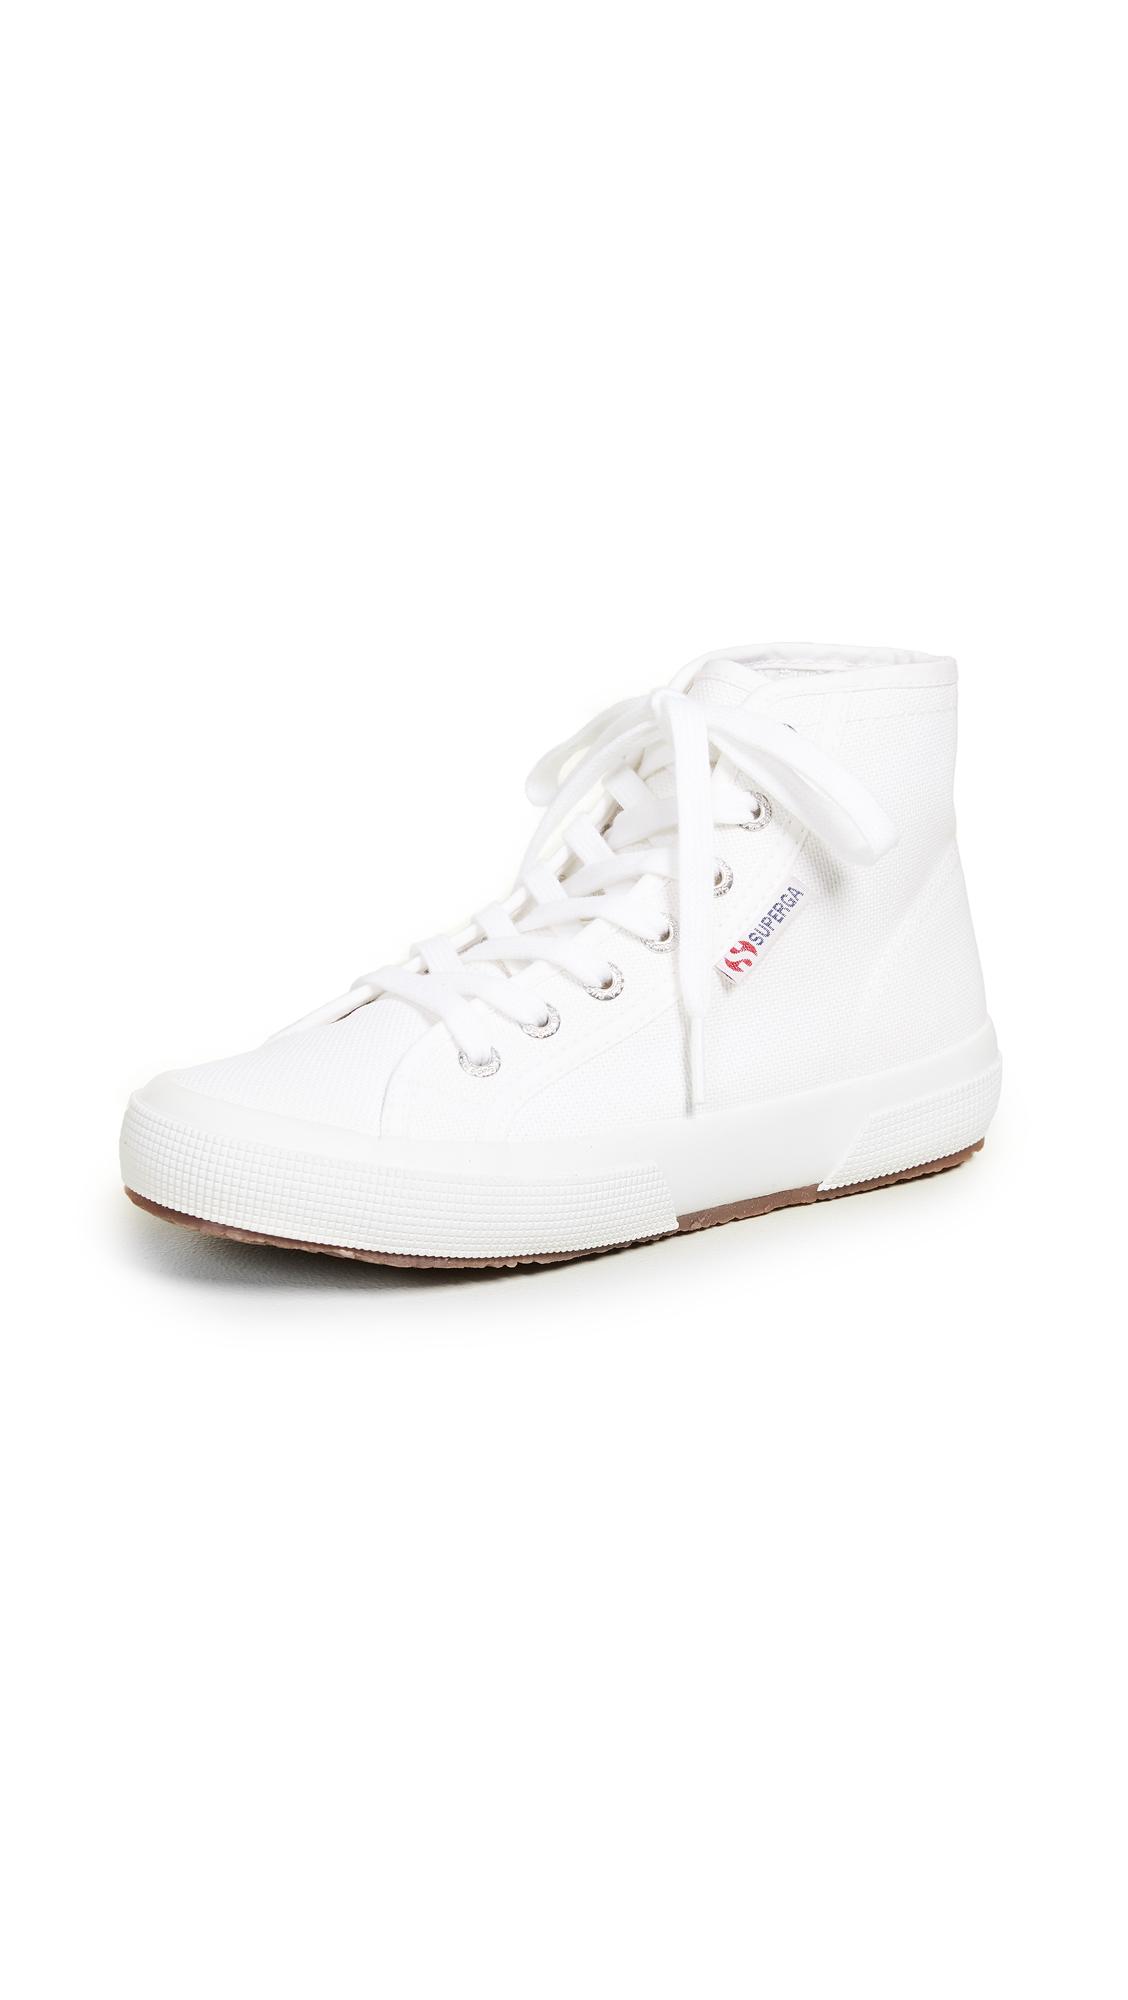 Superga 2795 Cotu High Top Classic Sneakers